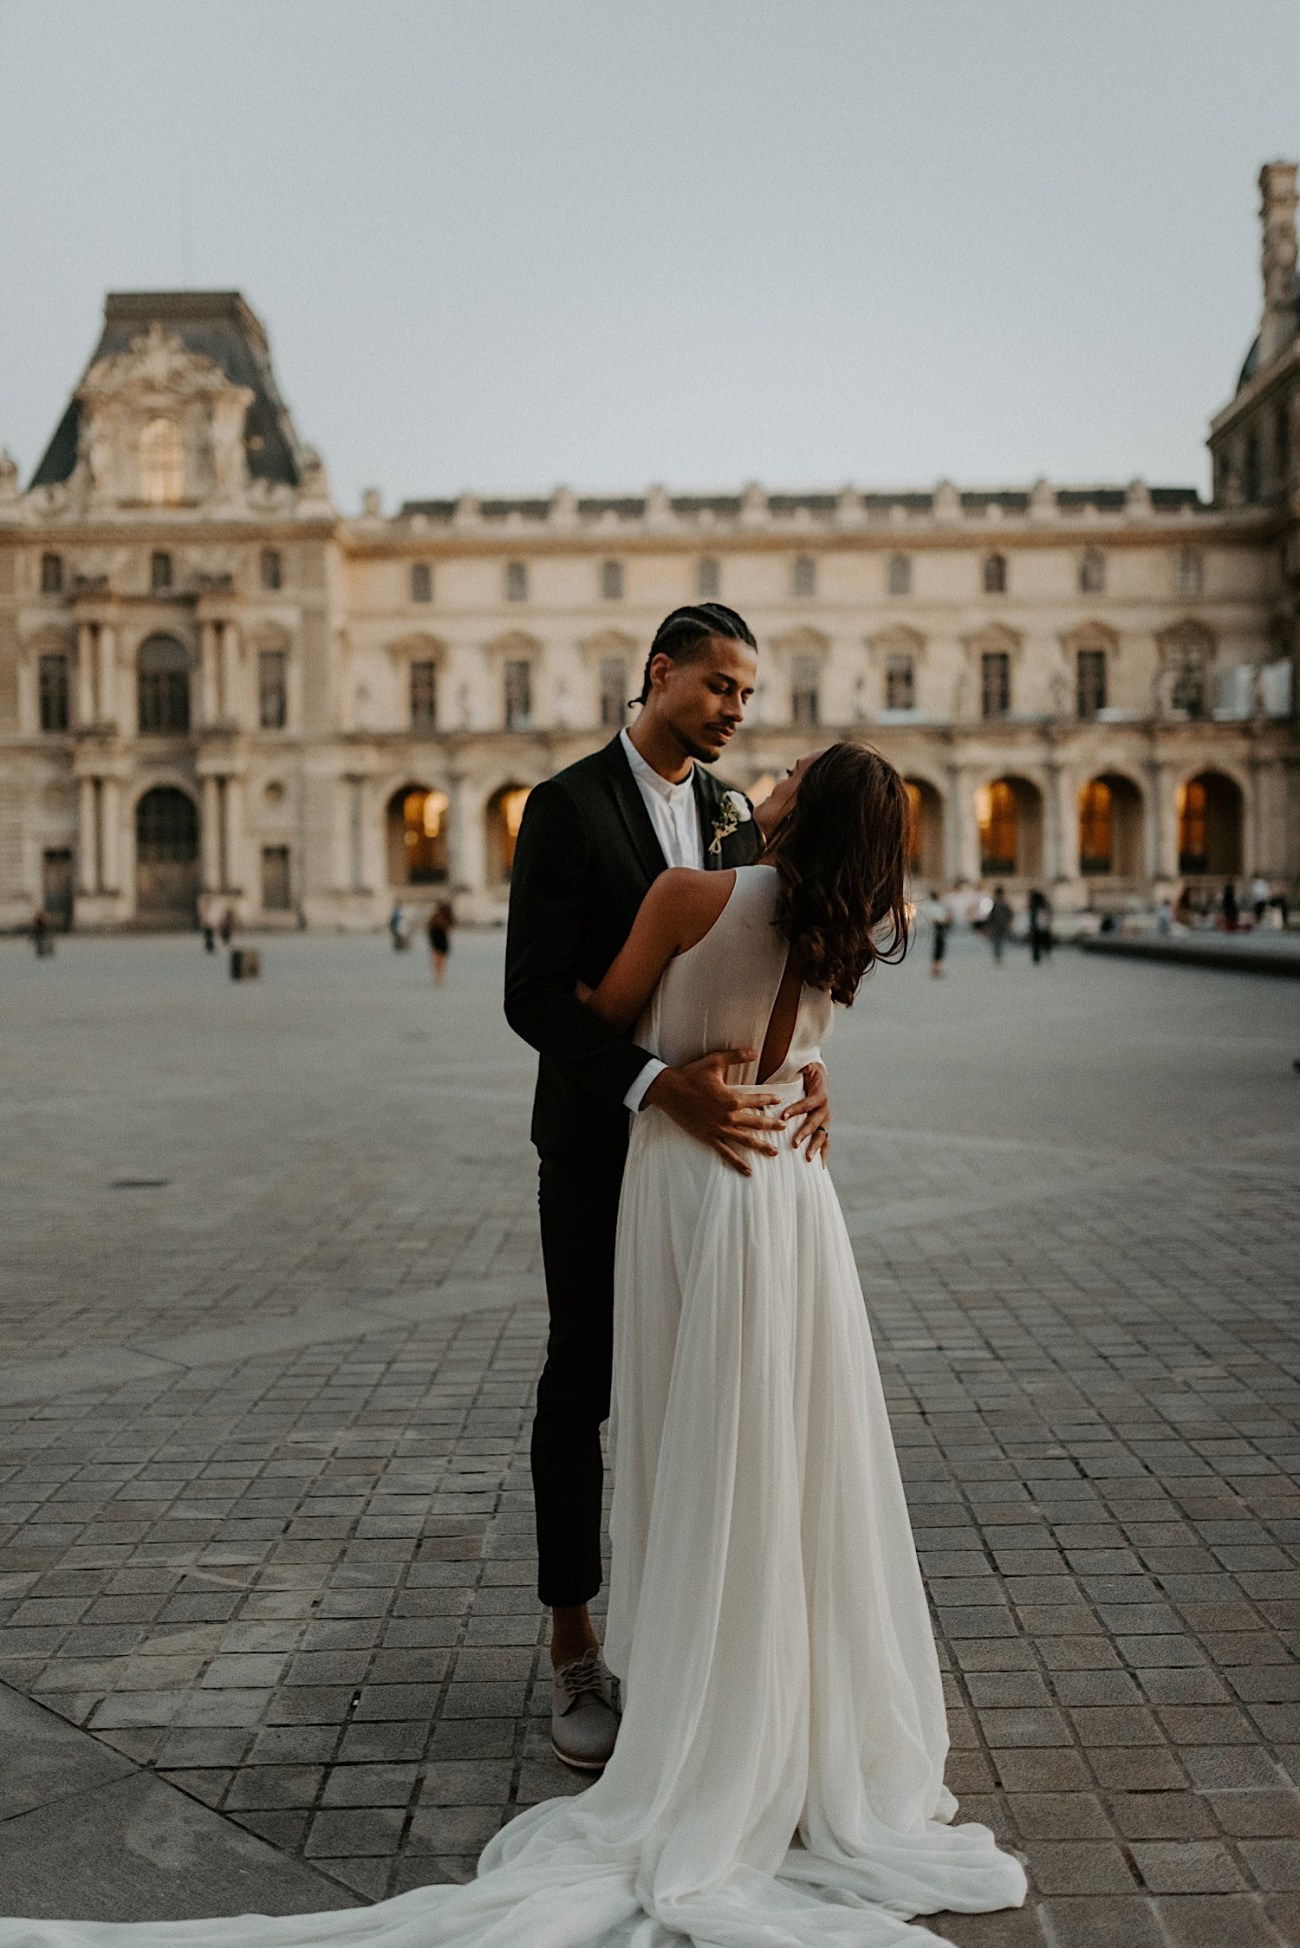 Paris Louvre Wedding Photos Paris Wedding Photographer Destination Wedding France Anais Possamai Photography 33